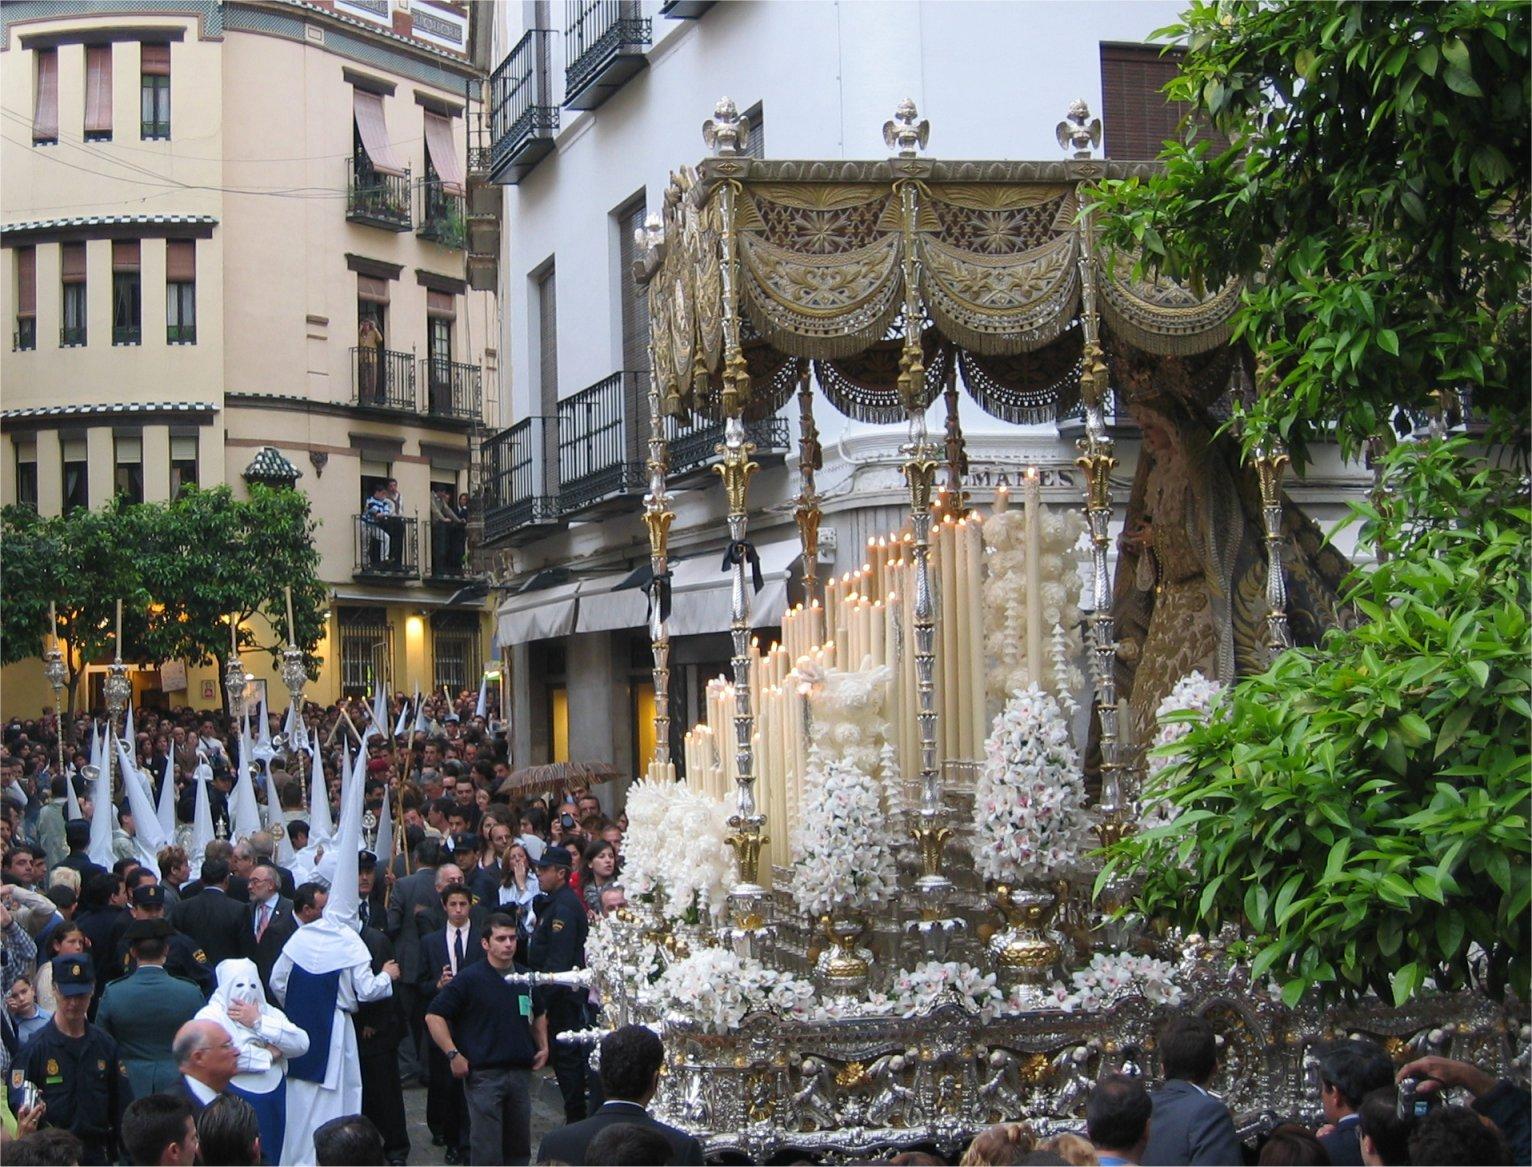 http://www.pvv.org/~erikad/Themepages/Travel/Andalucia/semana_santa/paso_maria.jpg